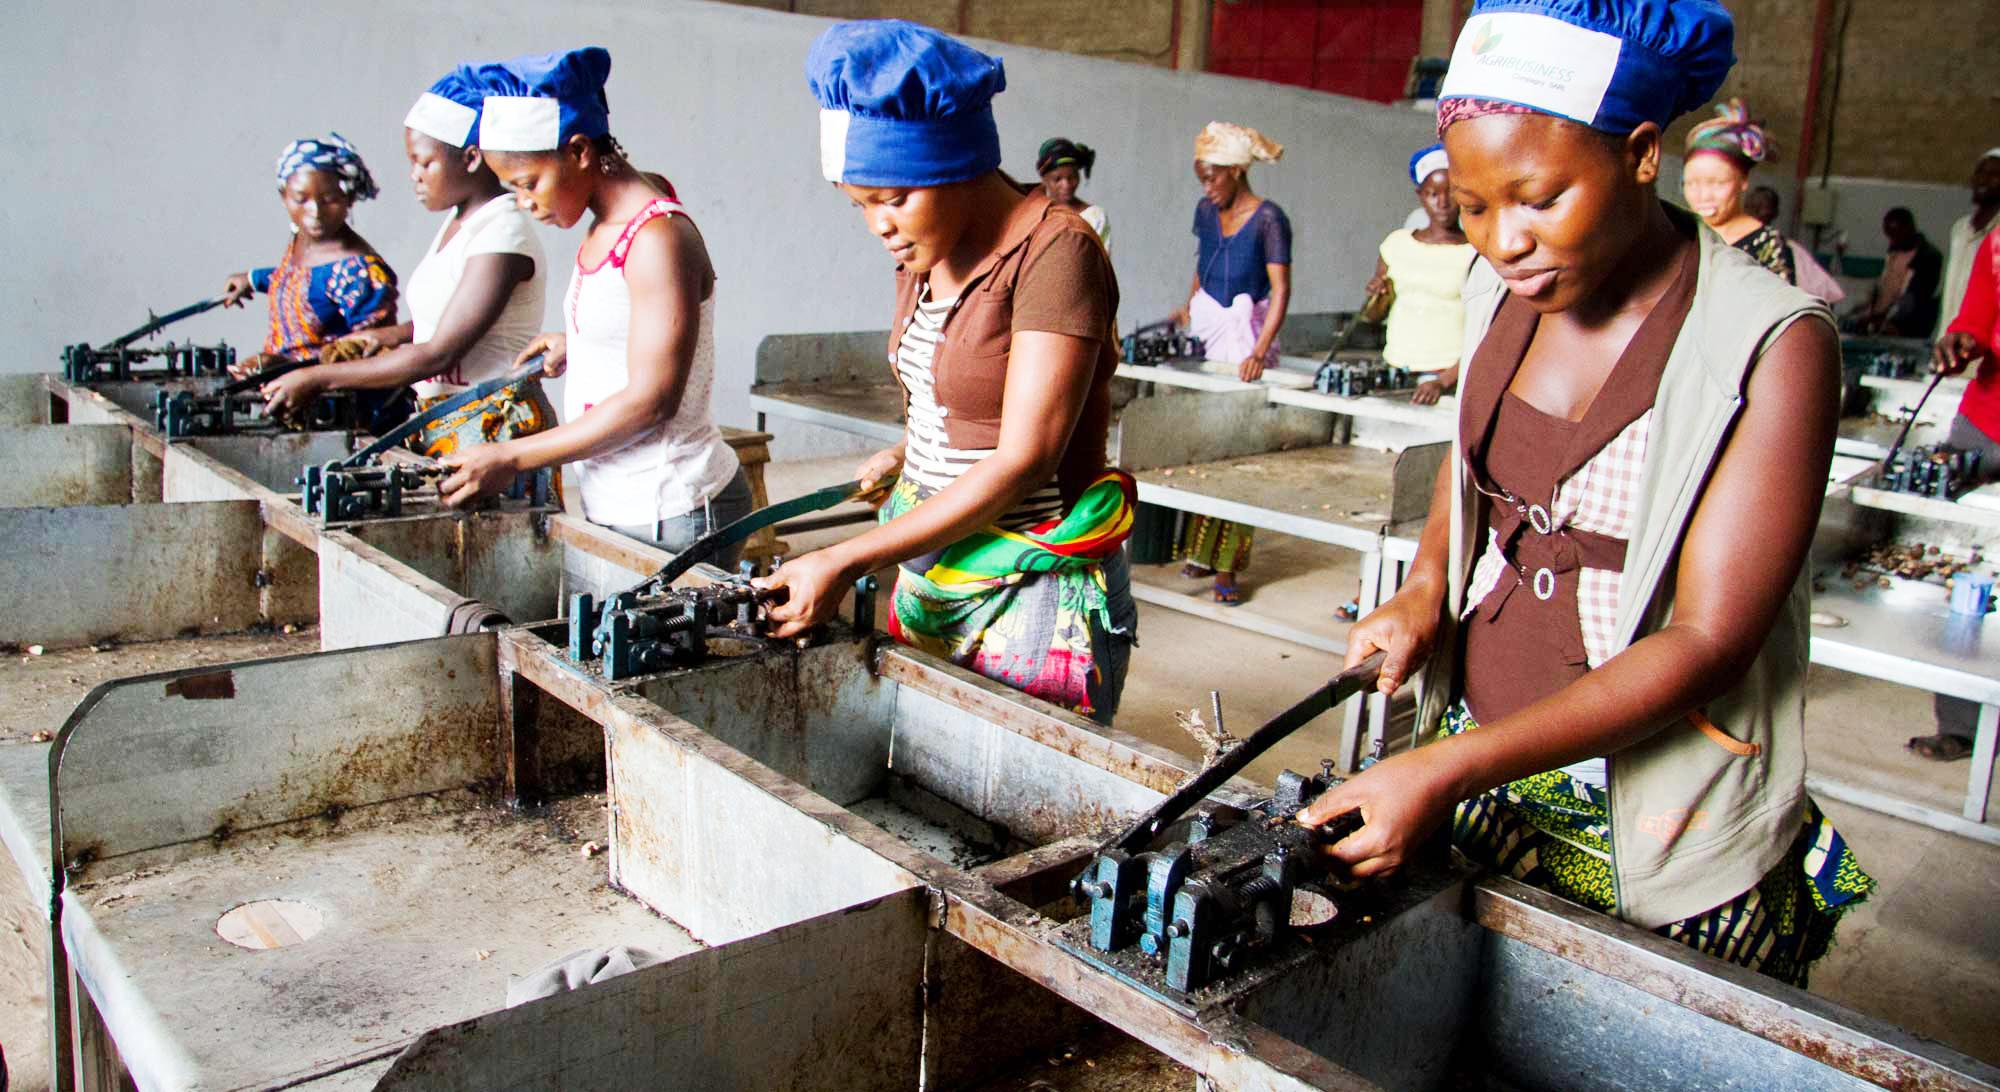 China has Kenya's nascent manufacturing base on its knees